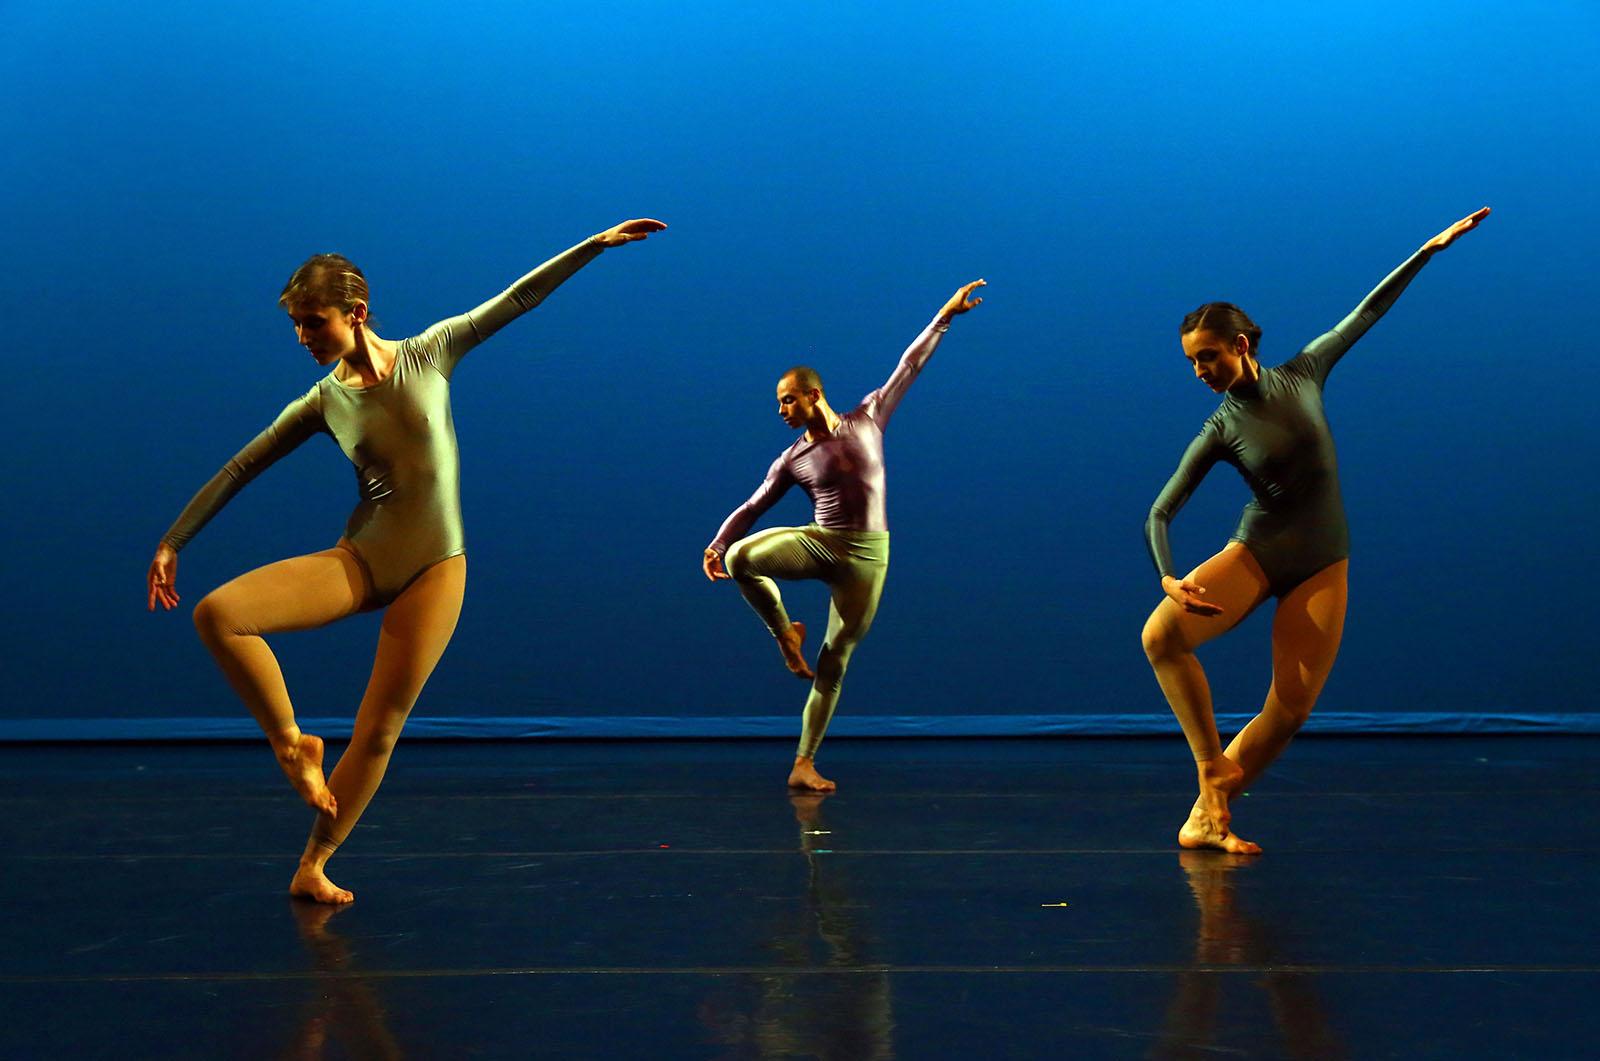 Danse, Compagnie CNDC-Angers Robert Swinston au Joyce Theater